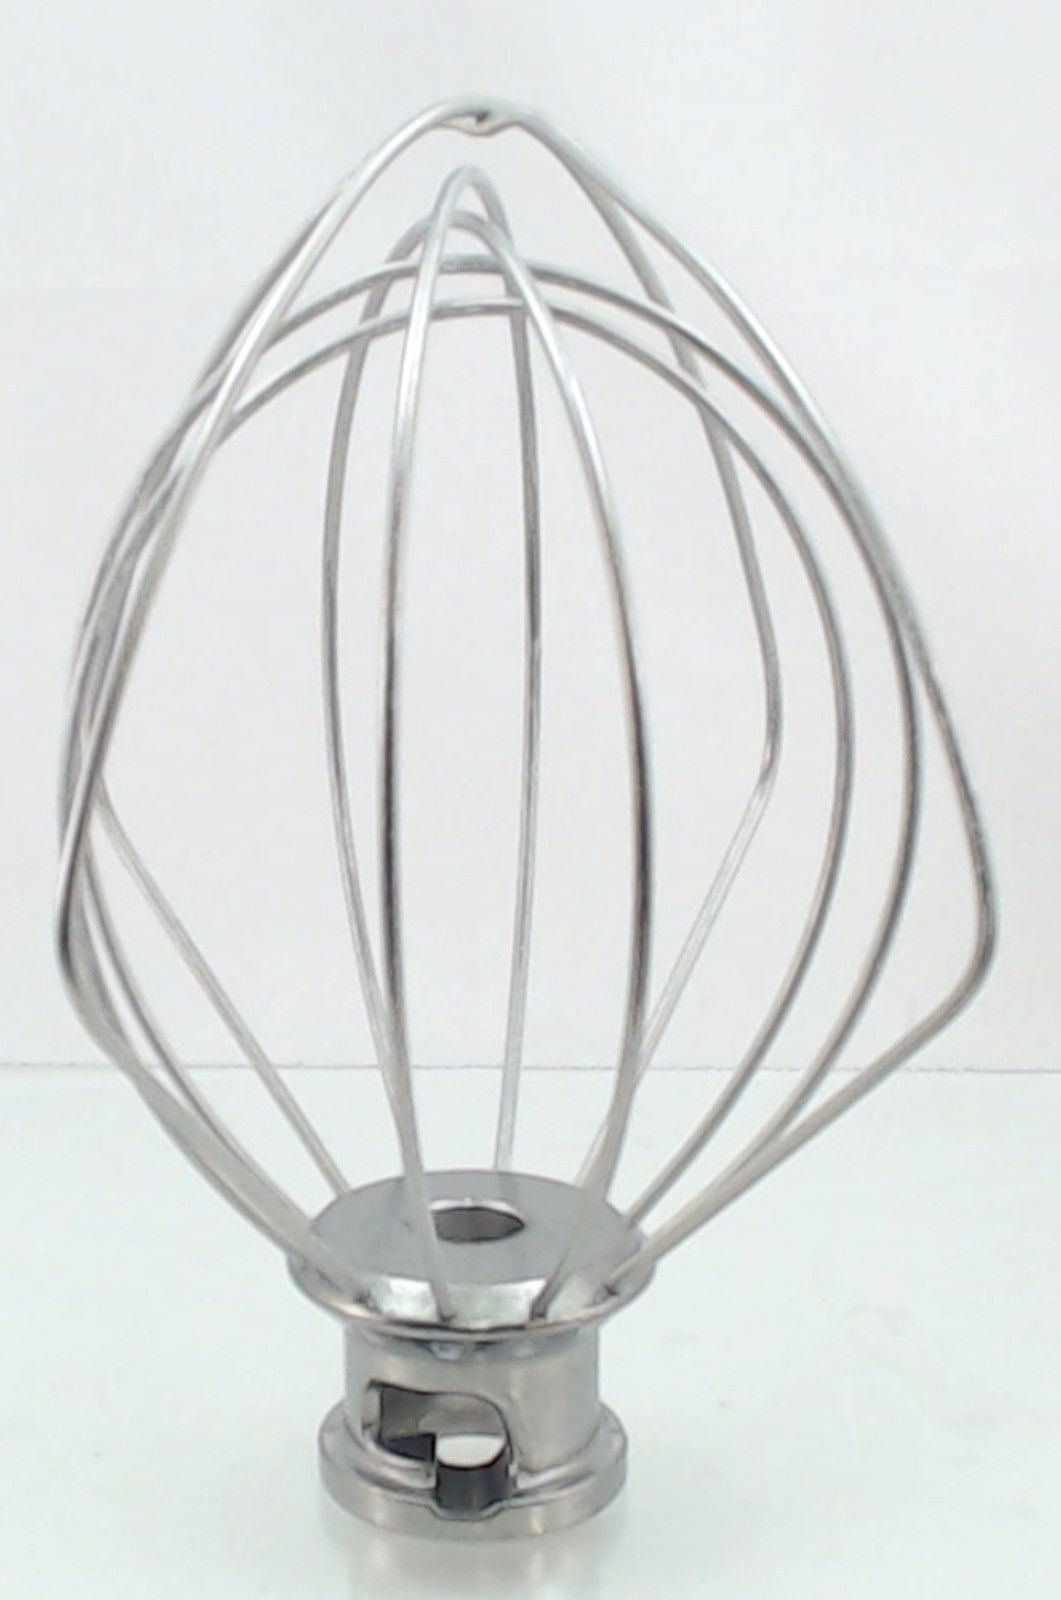 New Stand Mixer, 4.5 QT Wire Whip, for KitchenAid, K45WW, SA9704329